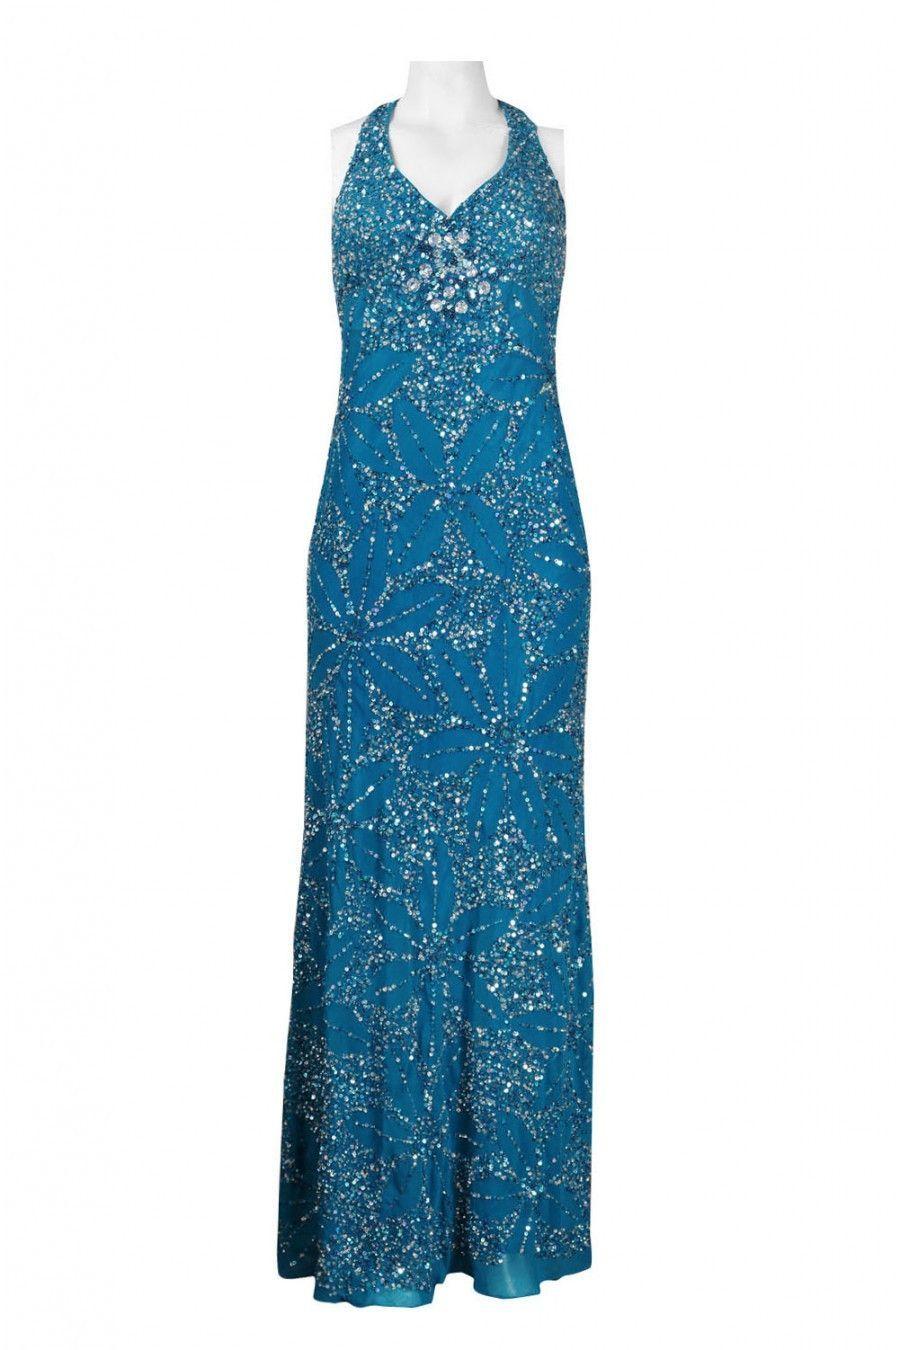 Adrianna Papell Halter Neck Beaded Floral Pattern Chiffon Dress